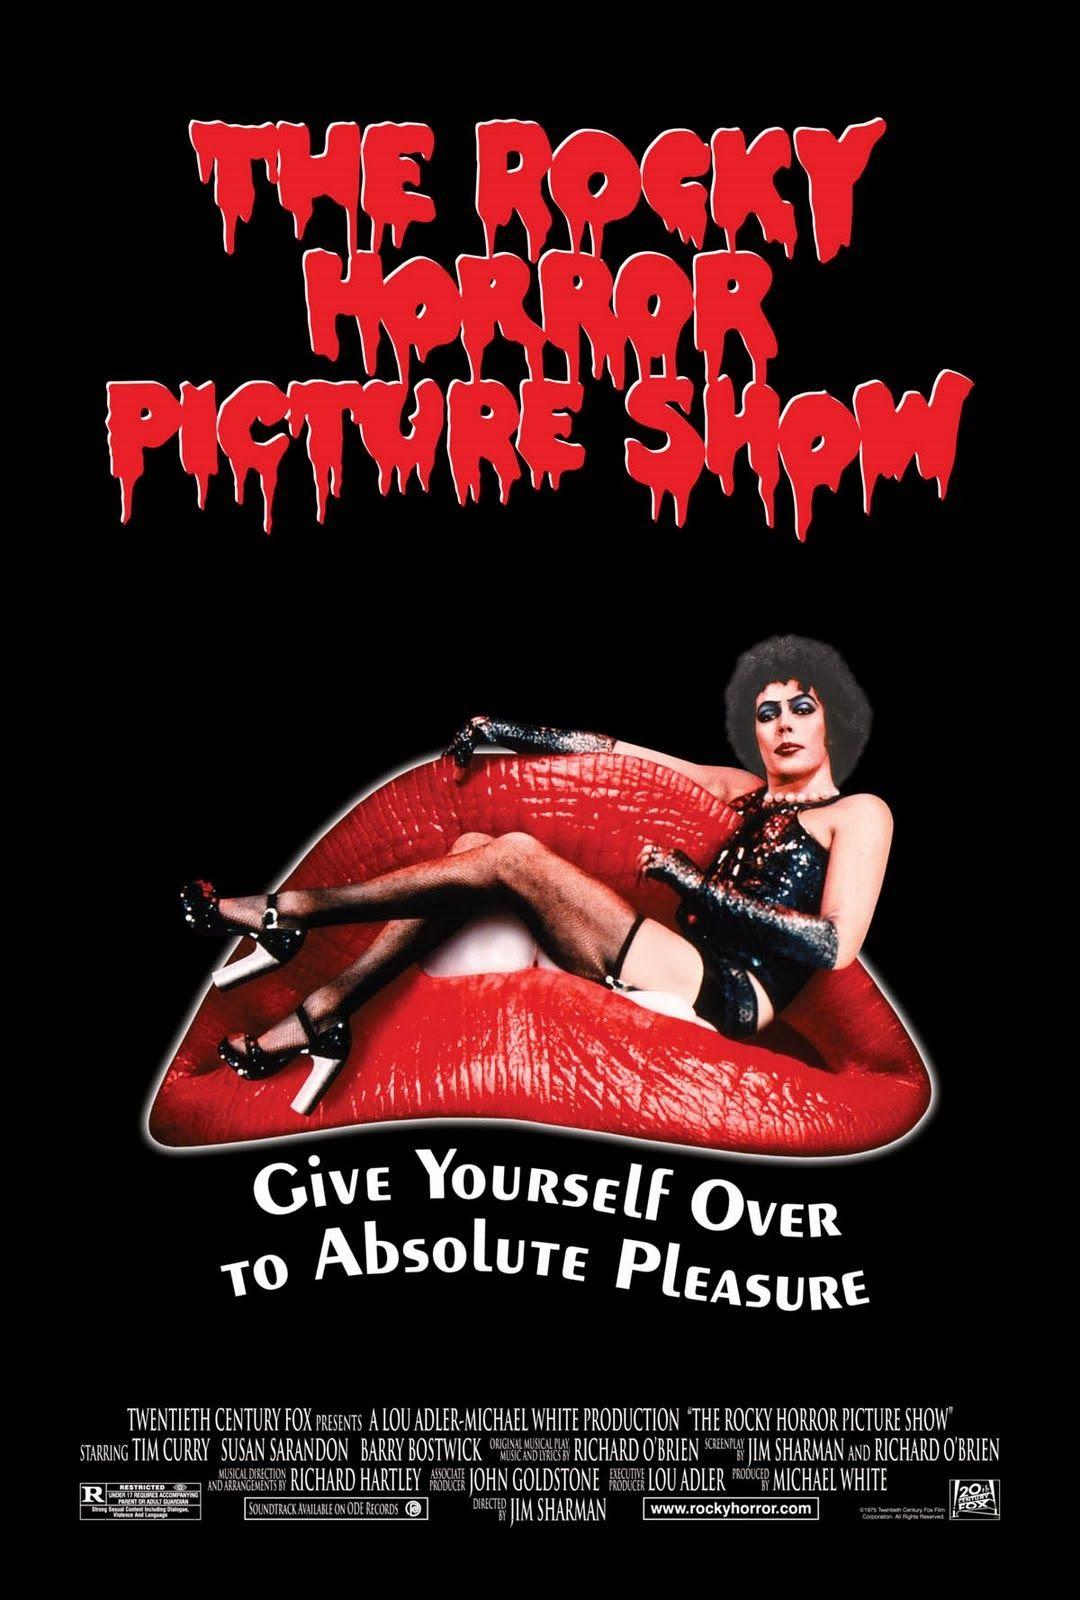 The Rocky Horror Picture Show 1975 Online Espanol Latino Peliculas De Culto Rocky Horror Peliculas De Terror